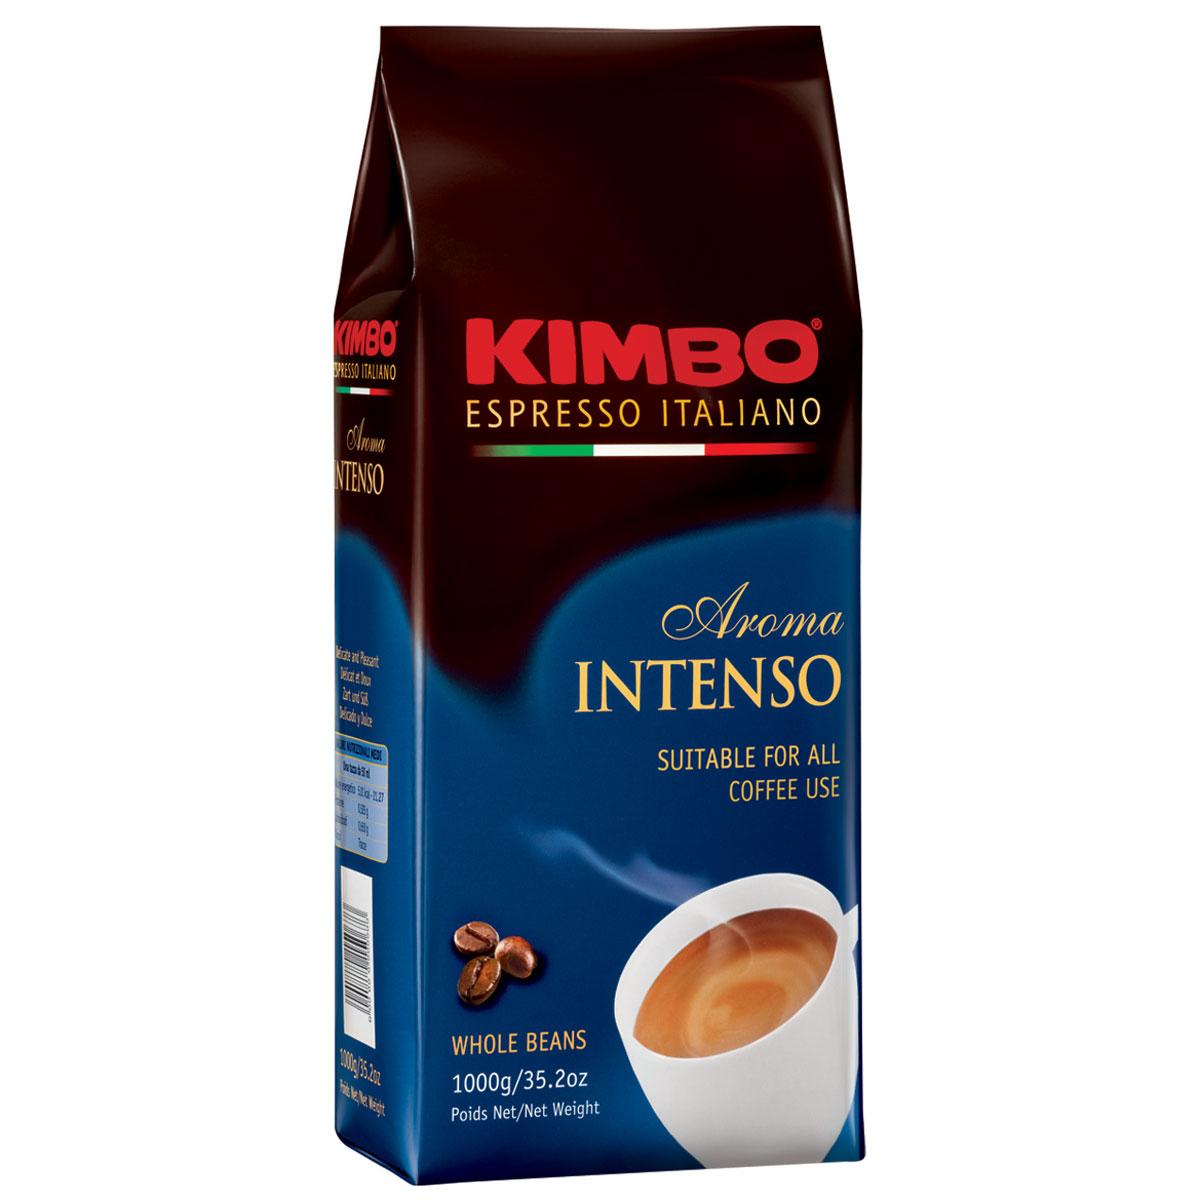 все цены на Kimbo Aroma Intenso кофе в зернах, 1 кг онлайн